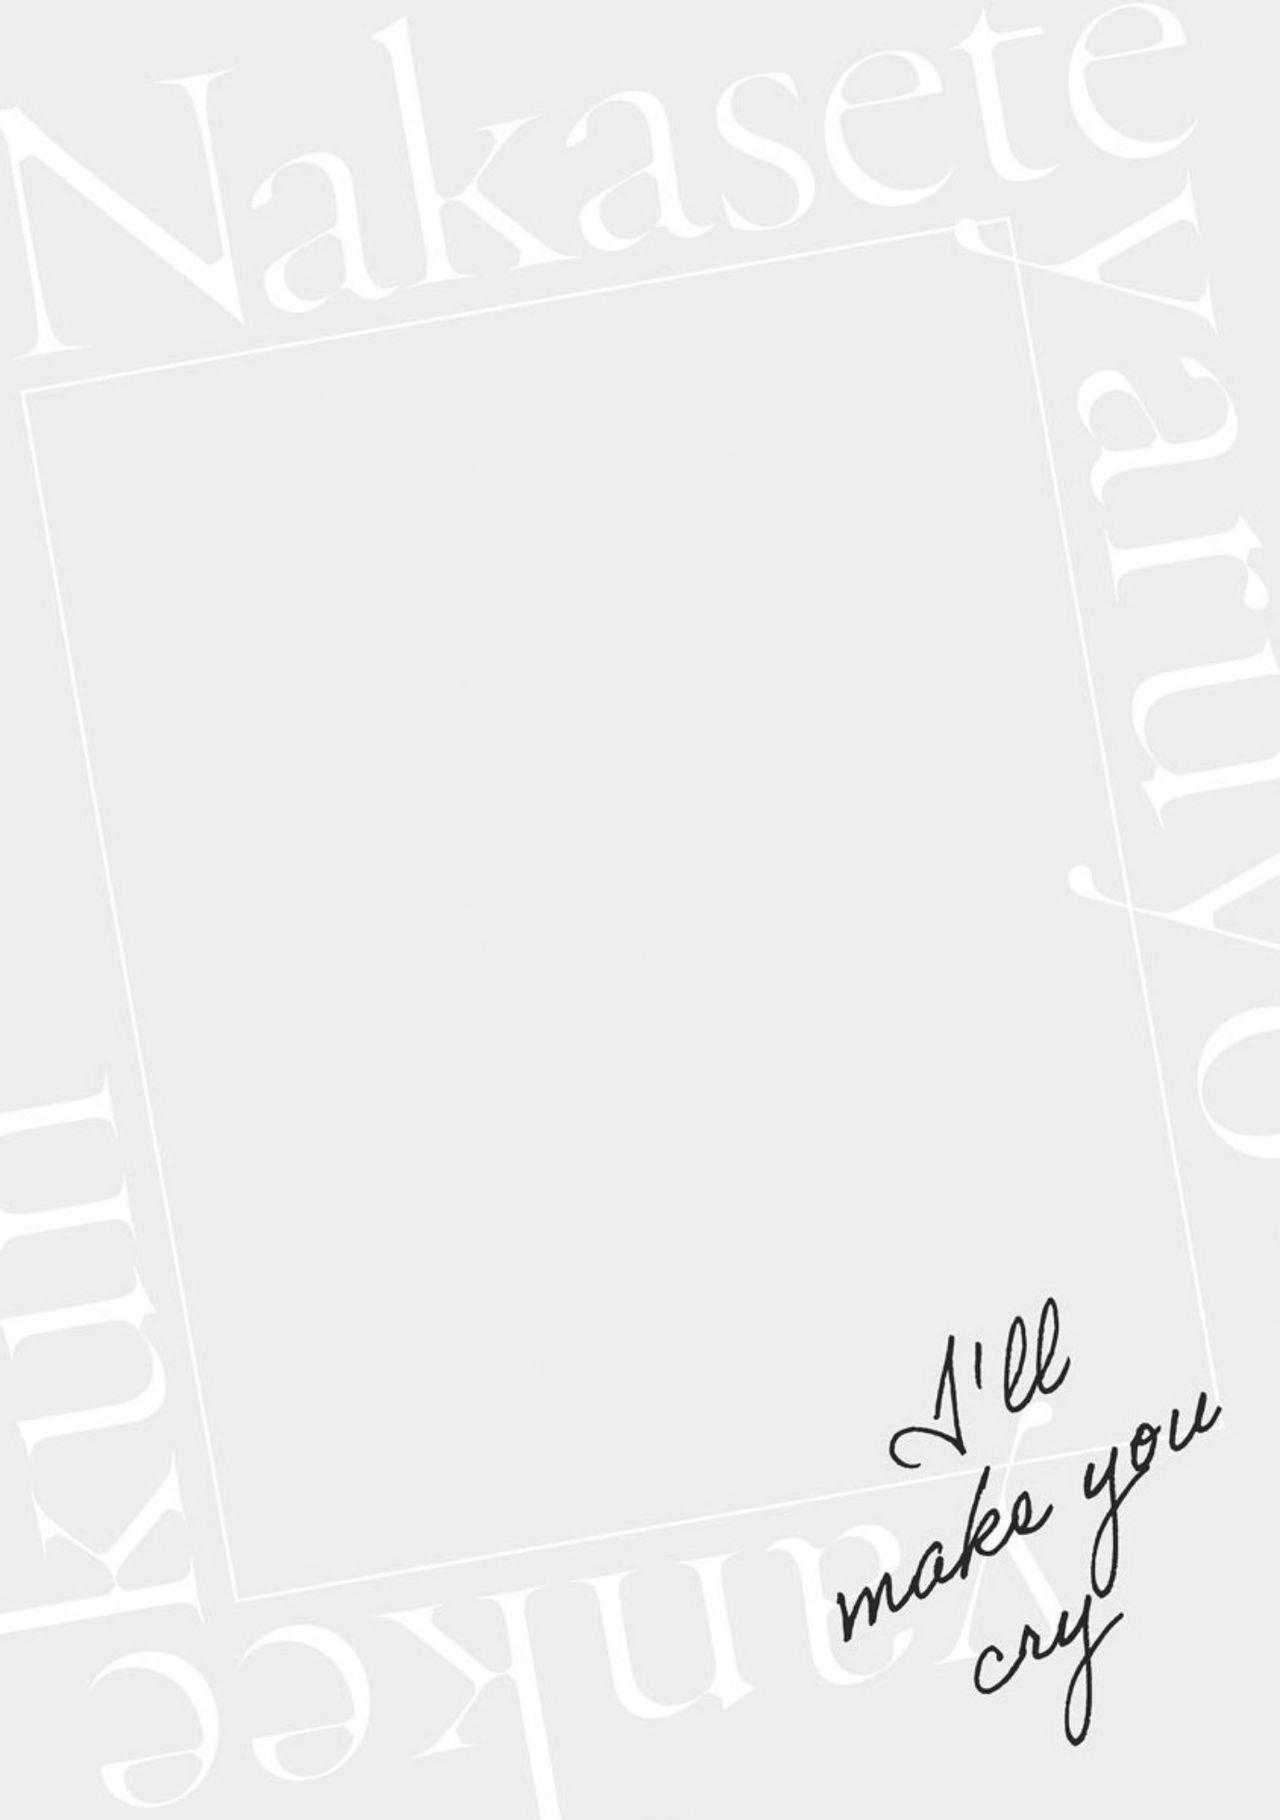 [Hiiragi Nozomu] Nakasete Yaru yo Yankee-kun   I'll Make You Cry Ch. 1-5 + Extras [English] [Digital] 83